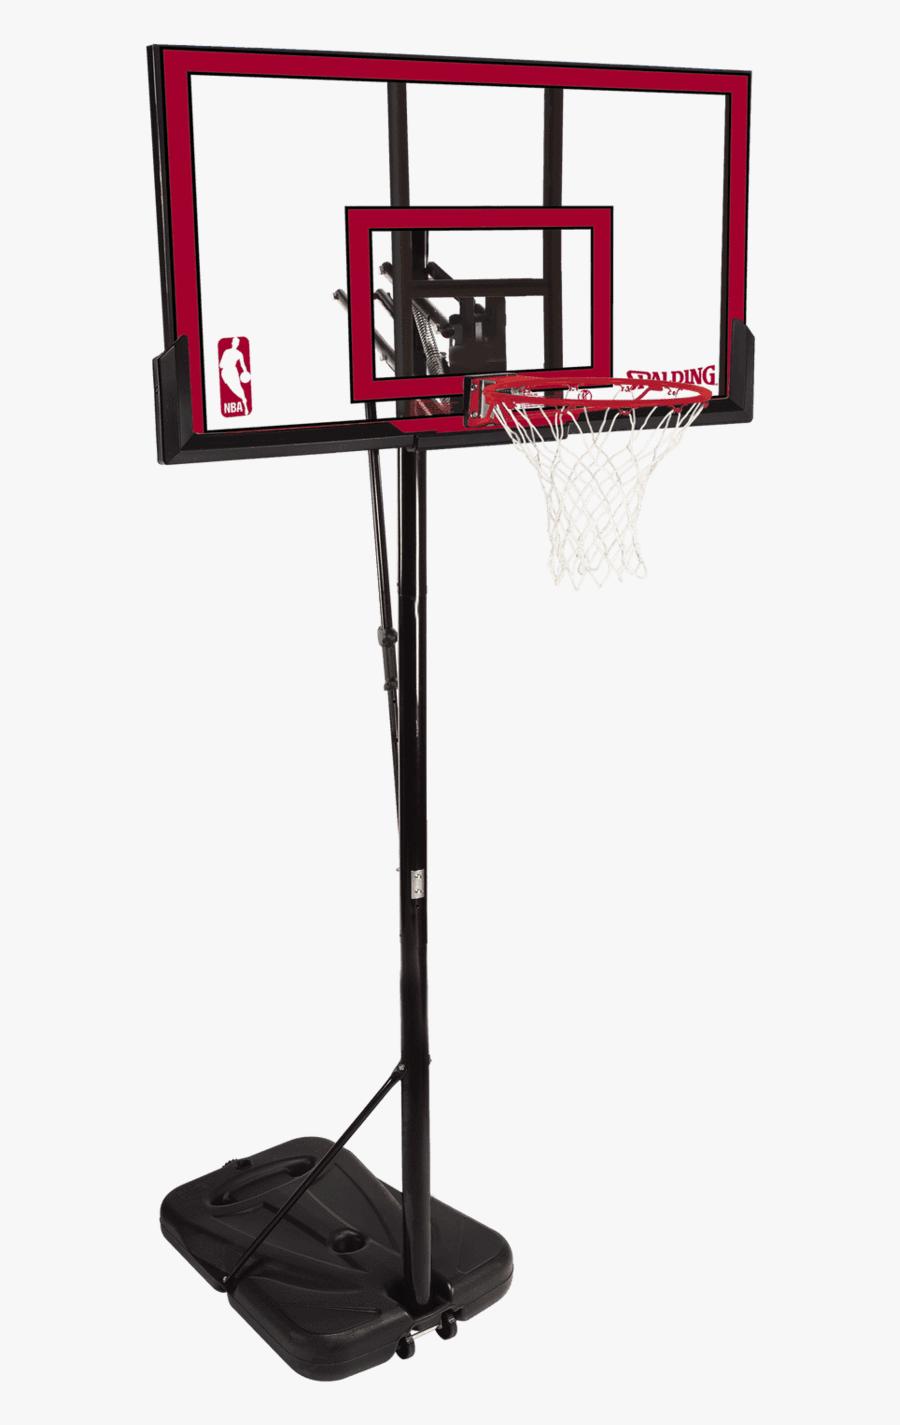 Spalding - Spalding Basketball Net, Transparent Clipart